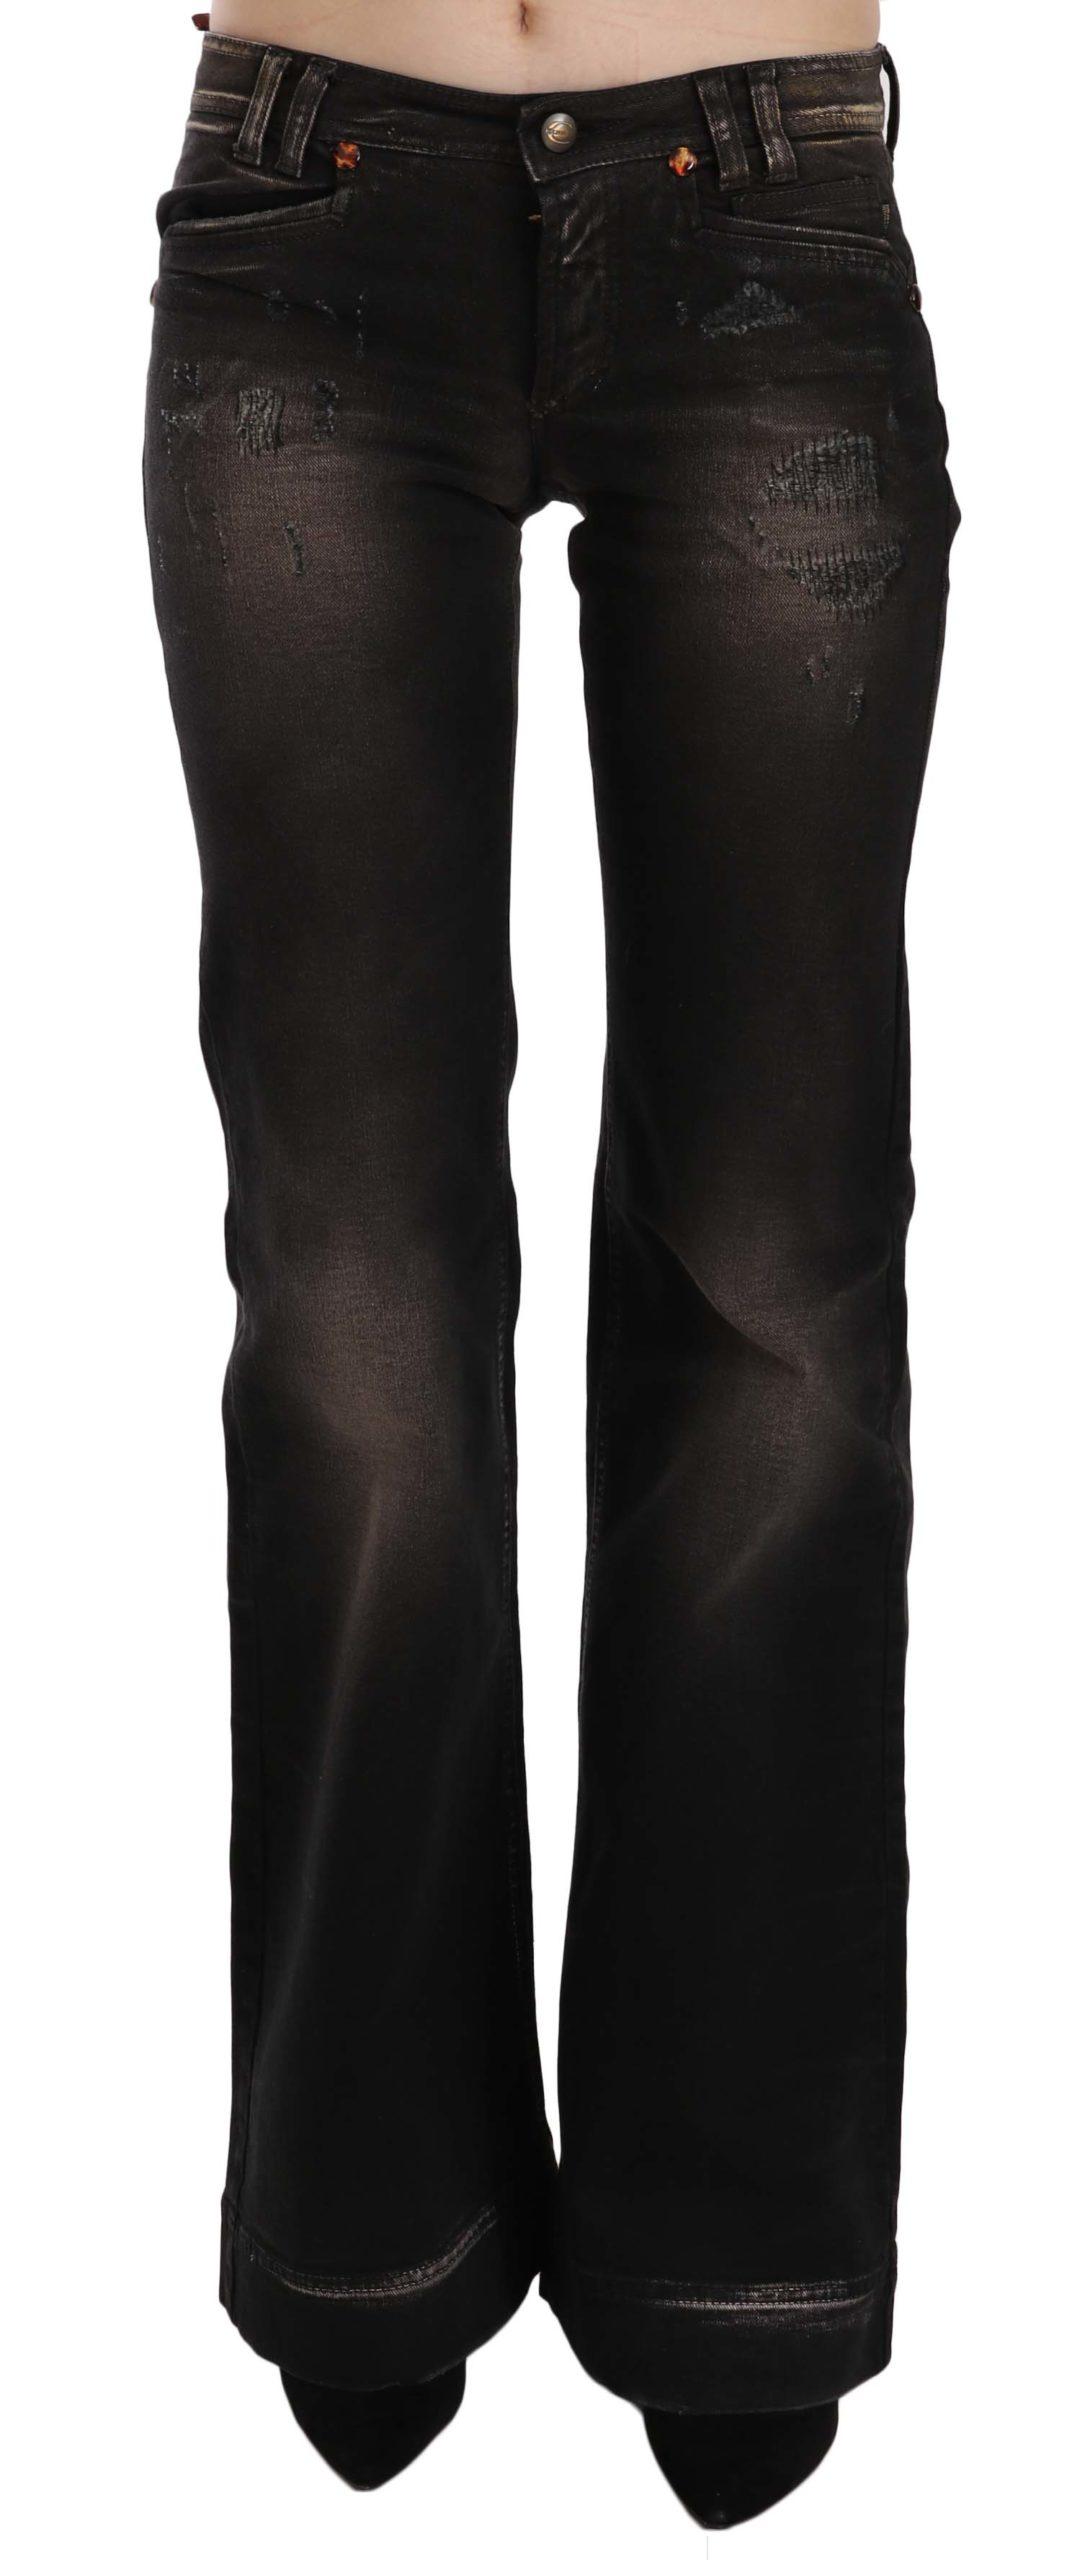 Just Cavalli Women's Low Waist Boot Cut Denim Trouser White PAN70351 - W25